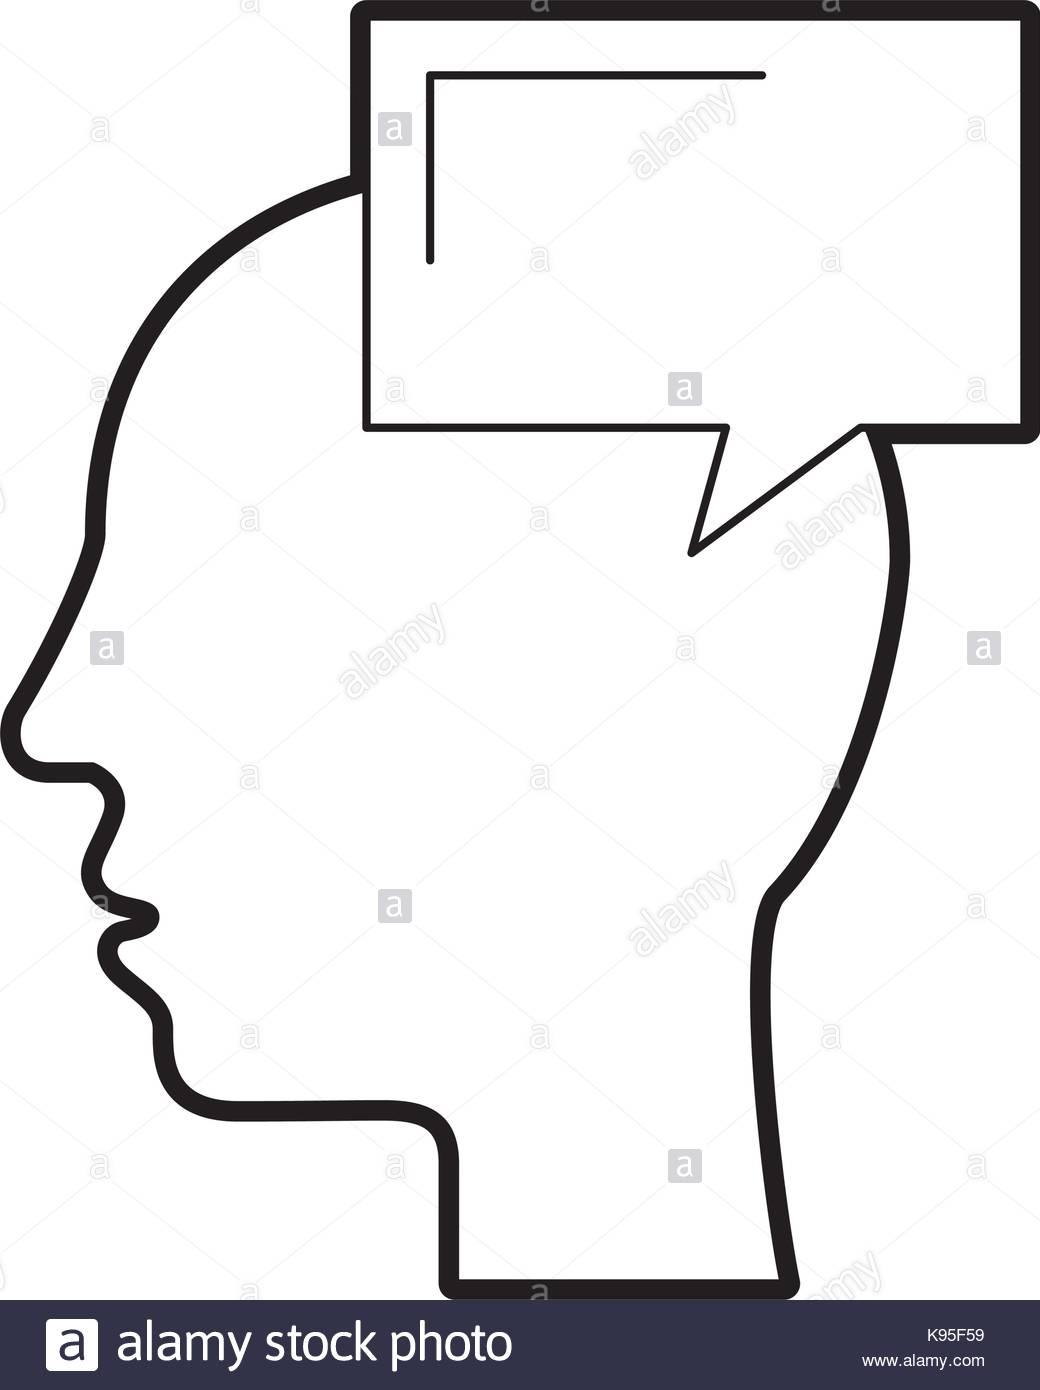 1040x1390 Silhouette Head Human Speech Bubble Communication Stock Vector Art